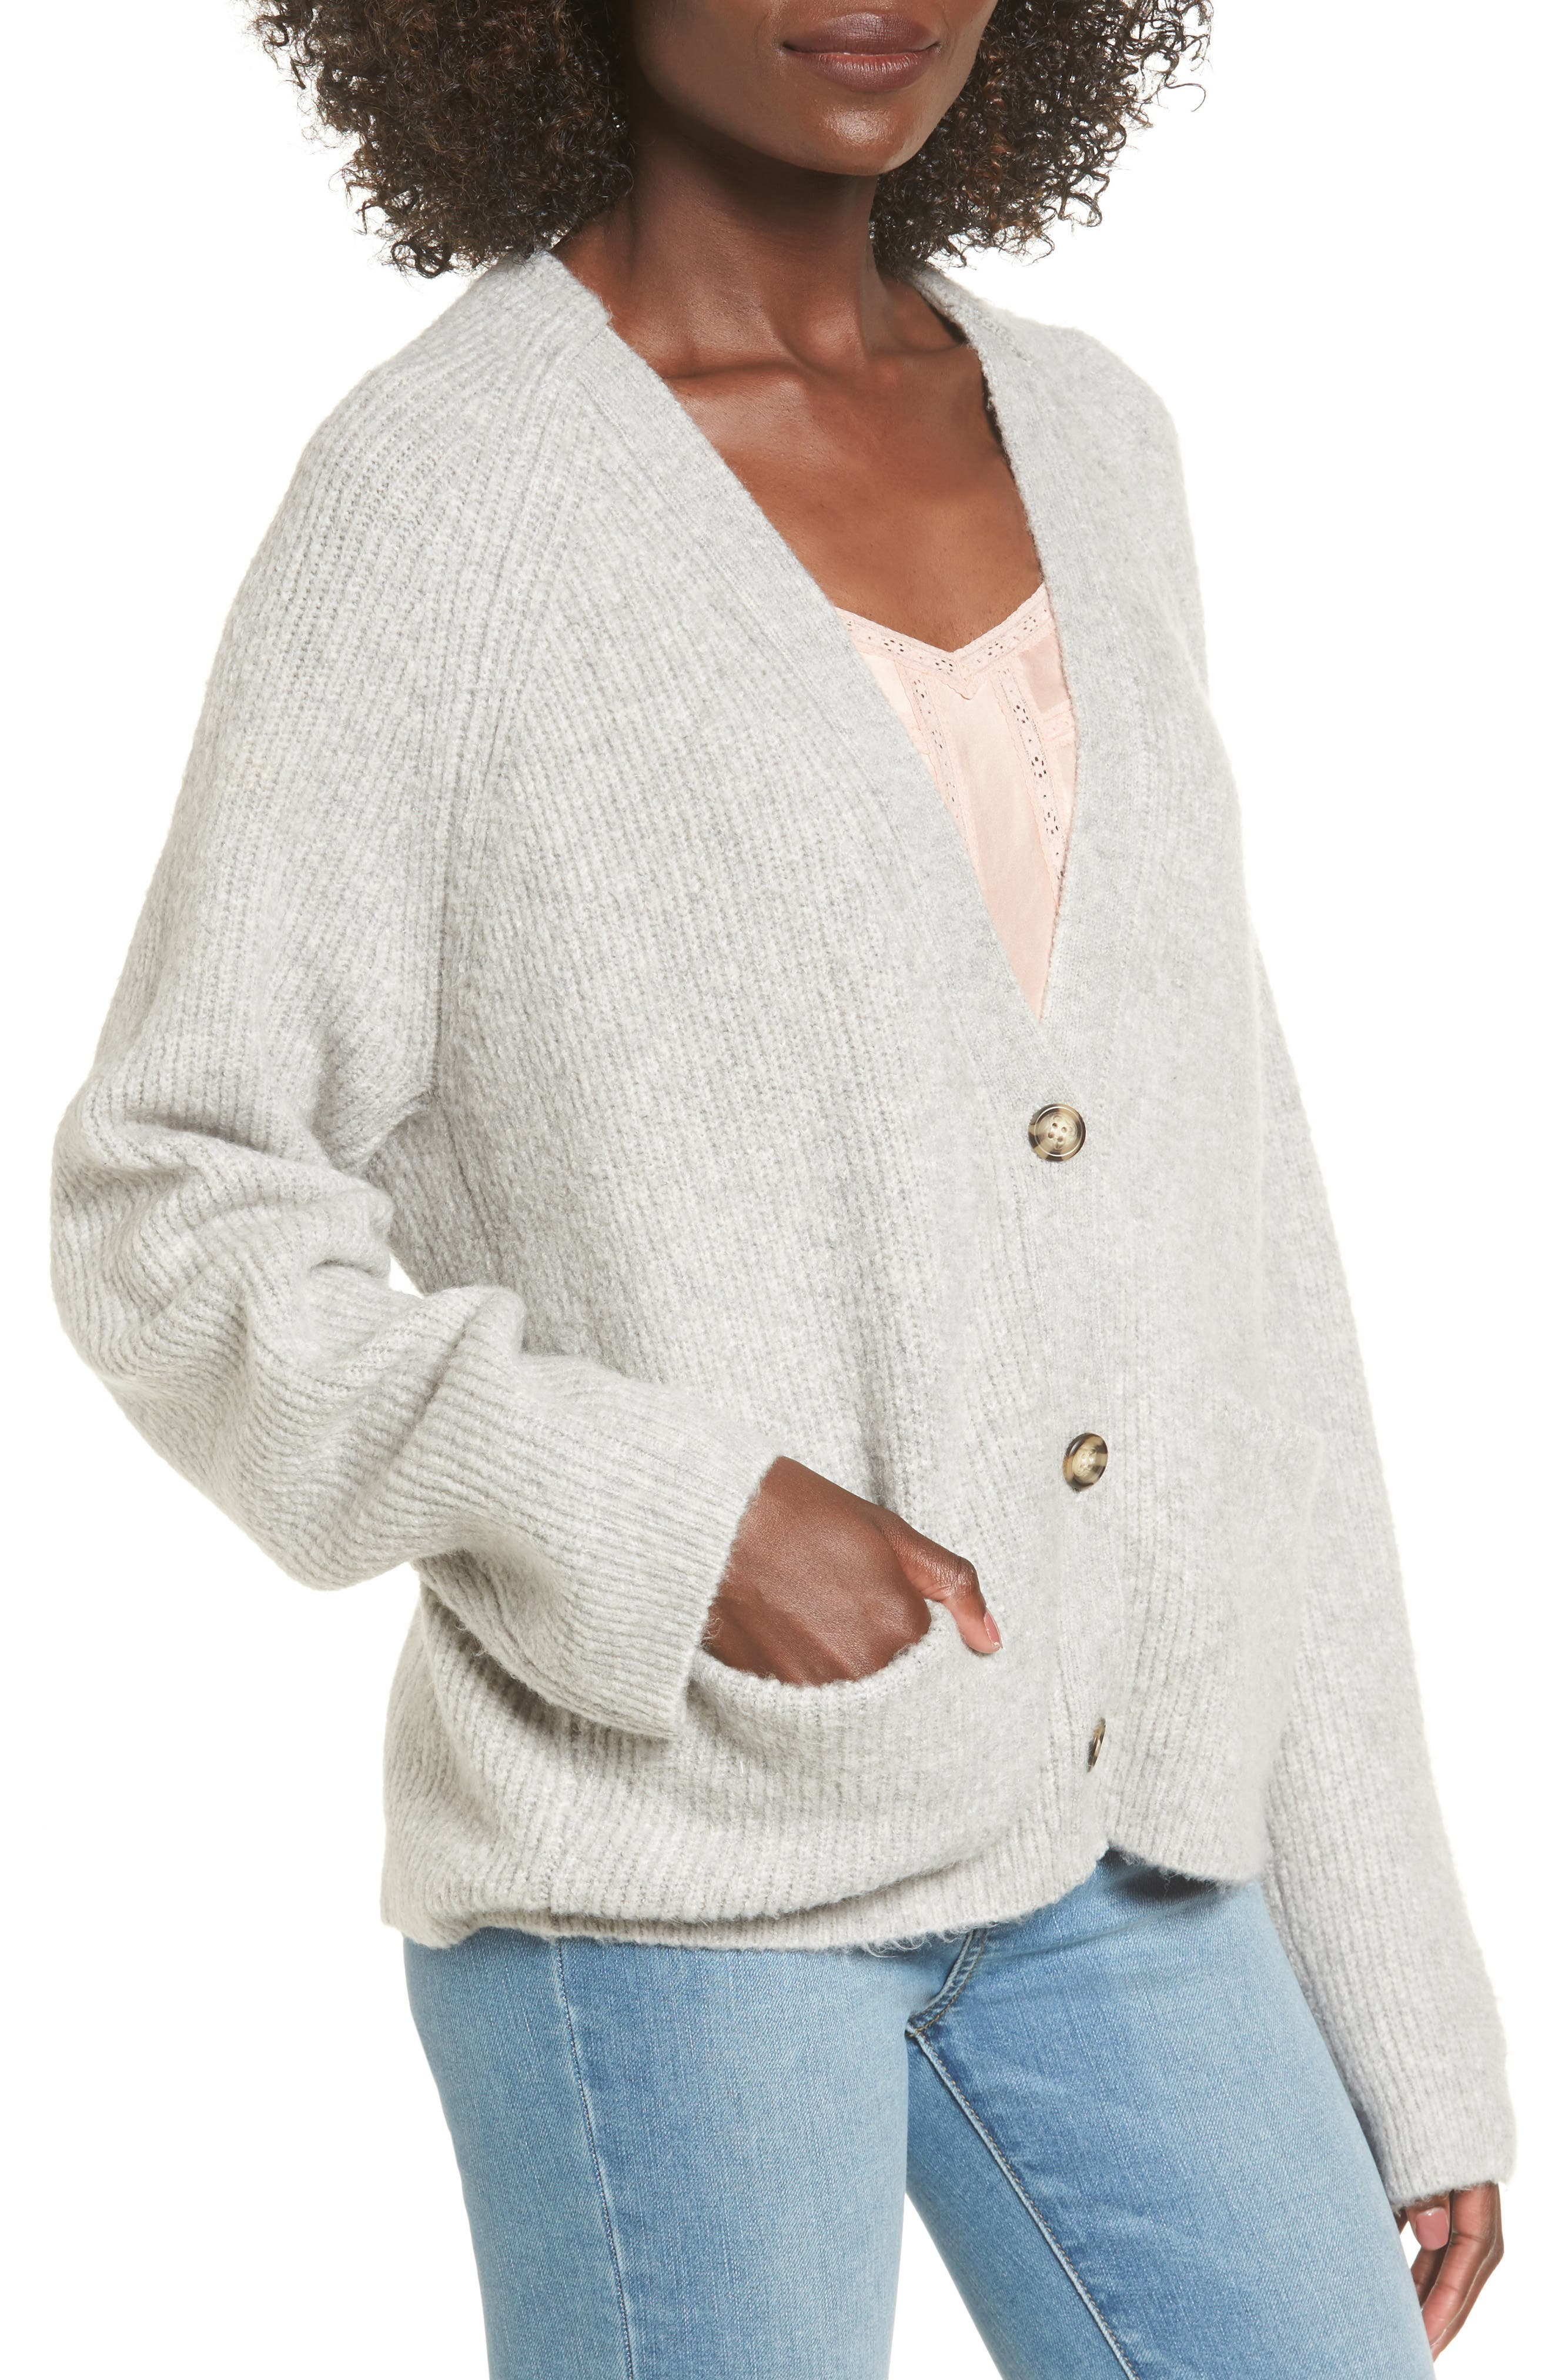 Cardigan Sweater,                             Alternate thumbnail 4, color,                             Grey Med Htr